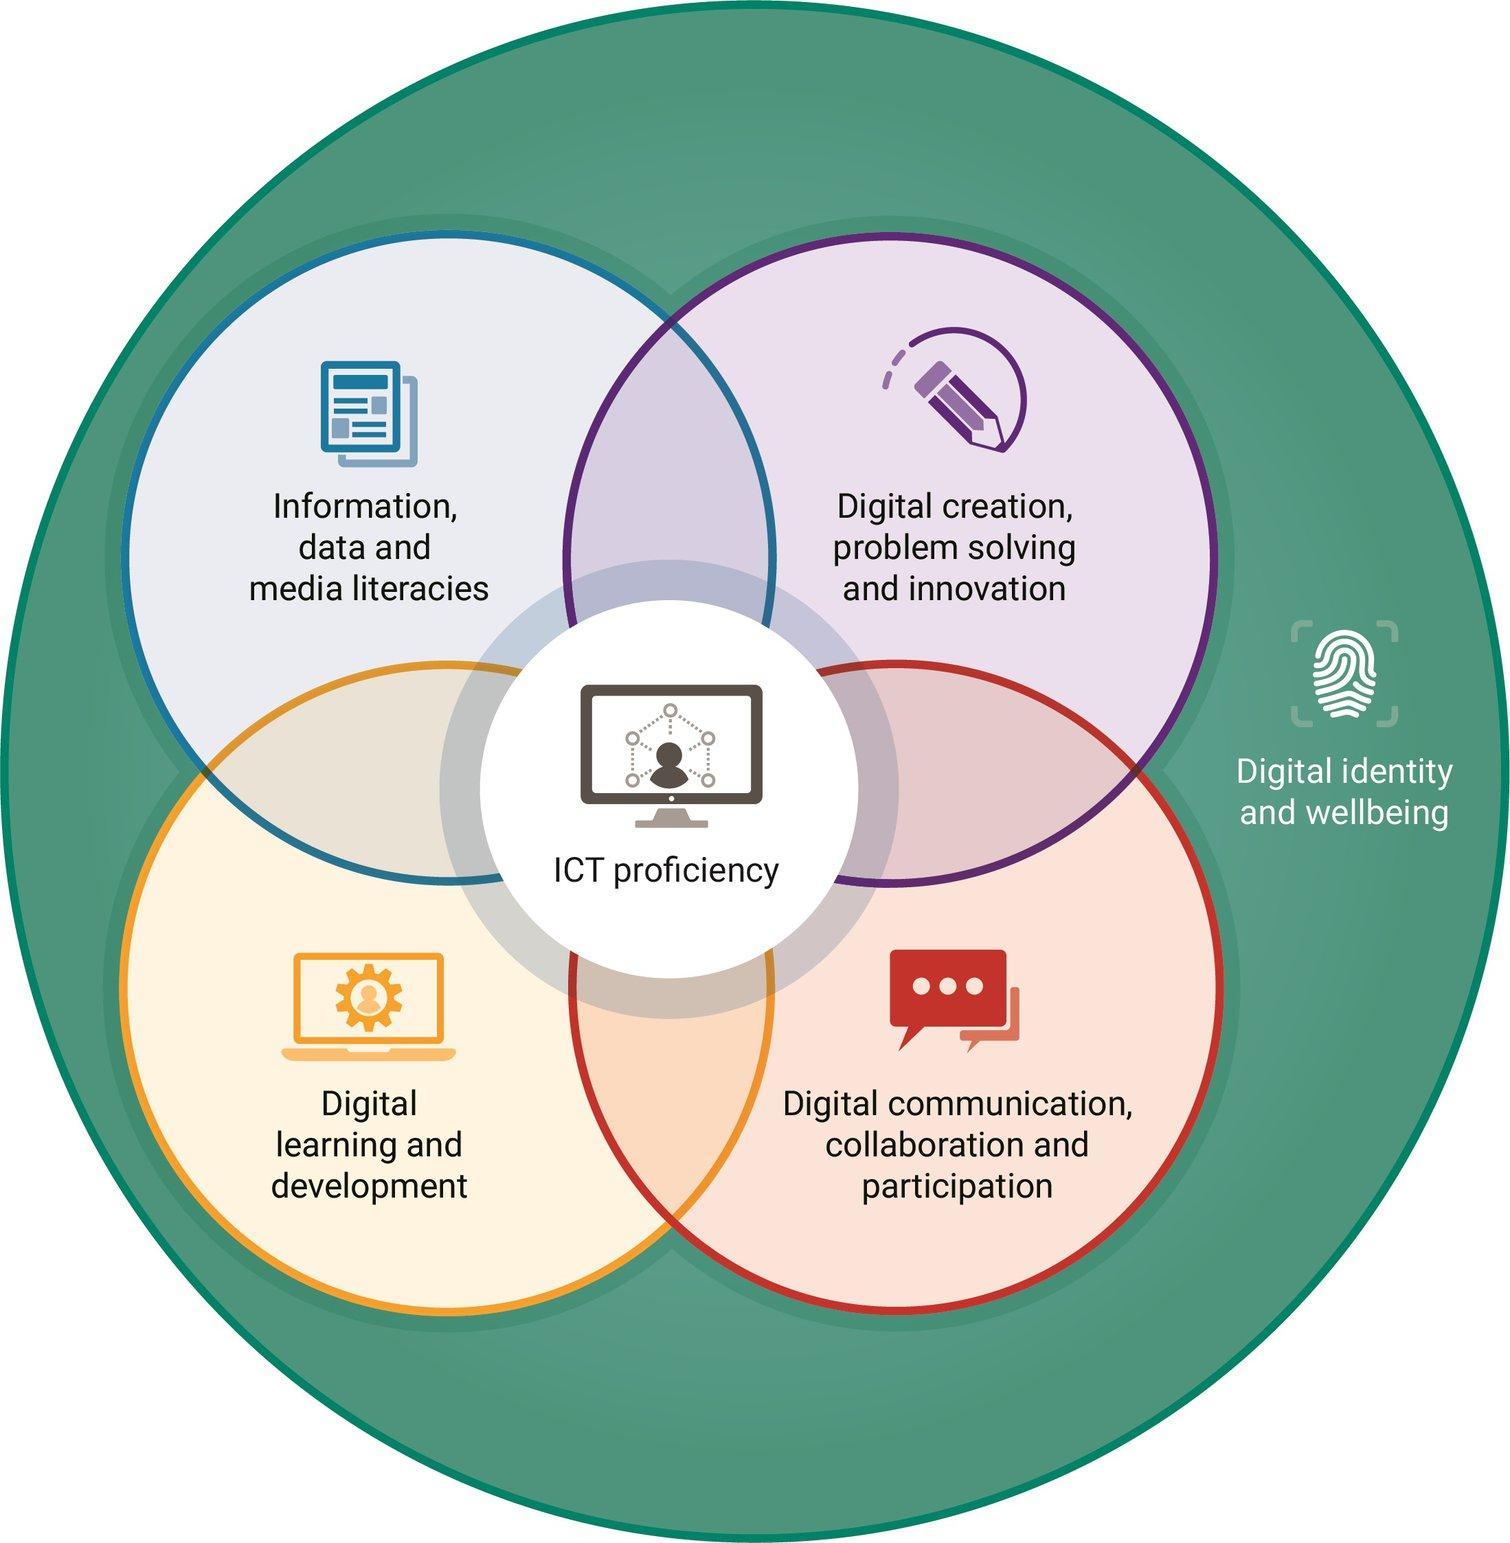 6 elements of digital capability